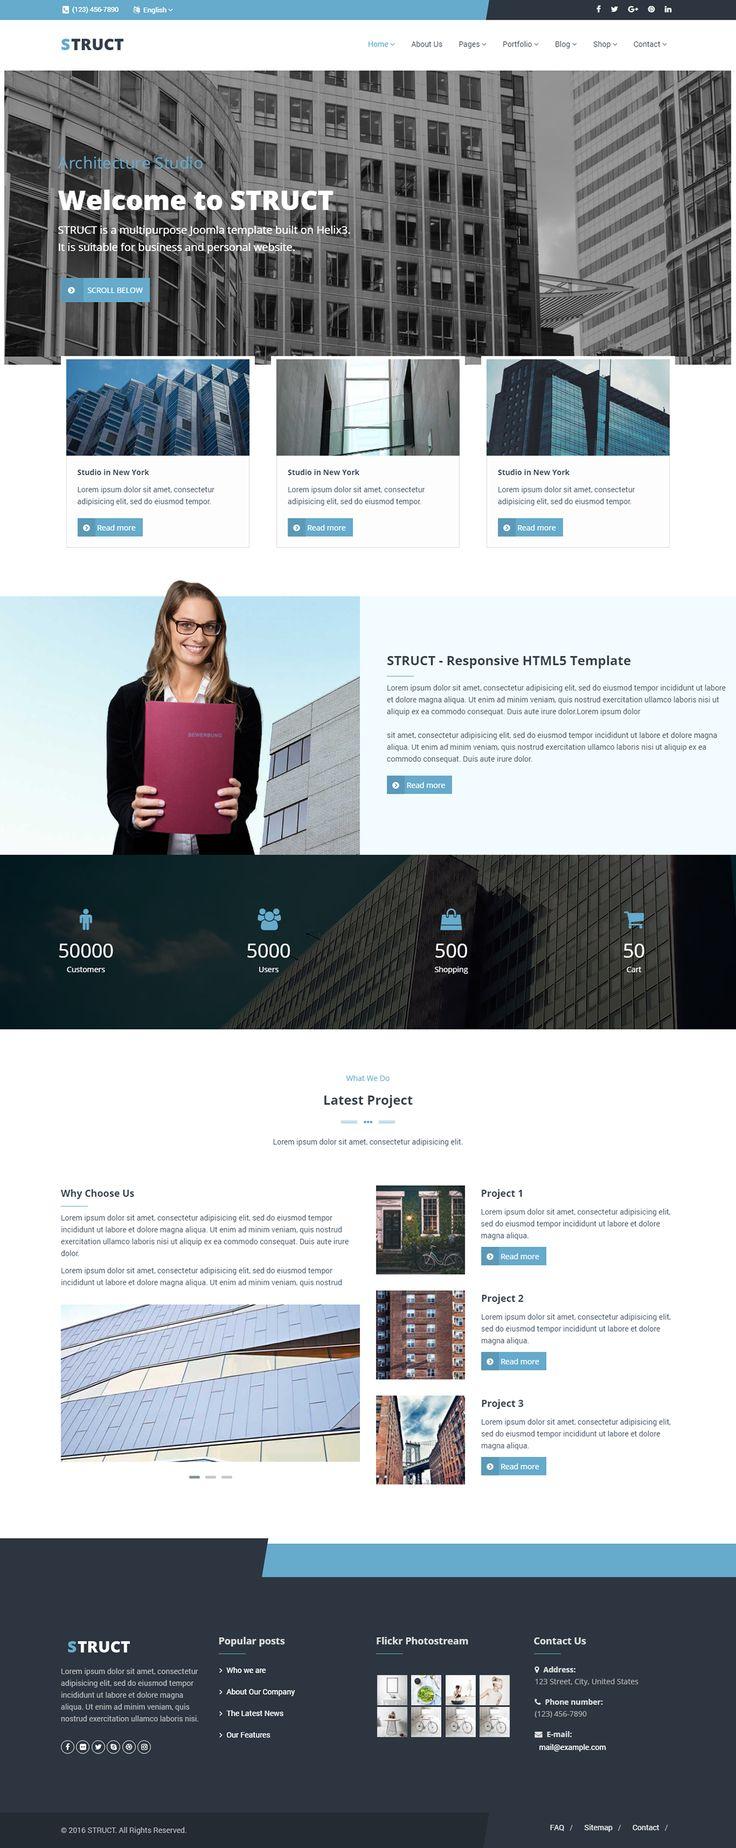 Struct - Multi-Purpose Joomla Responsive Virtuemart Template  Buy now: https://themeforest.net/item/struct-multipurpose-joomla-responsive-virtuemart-template/18771936